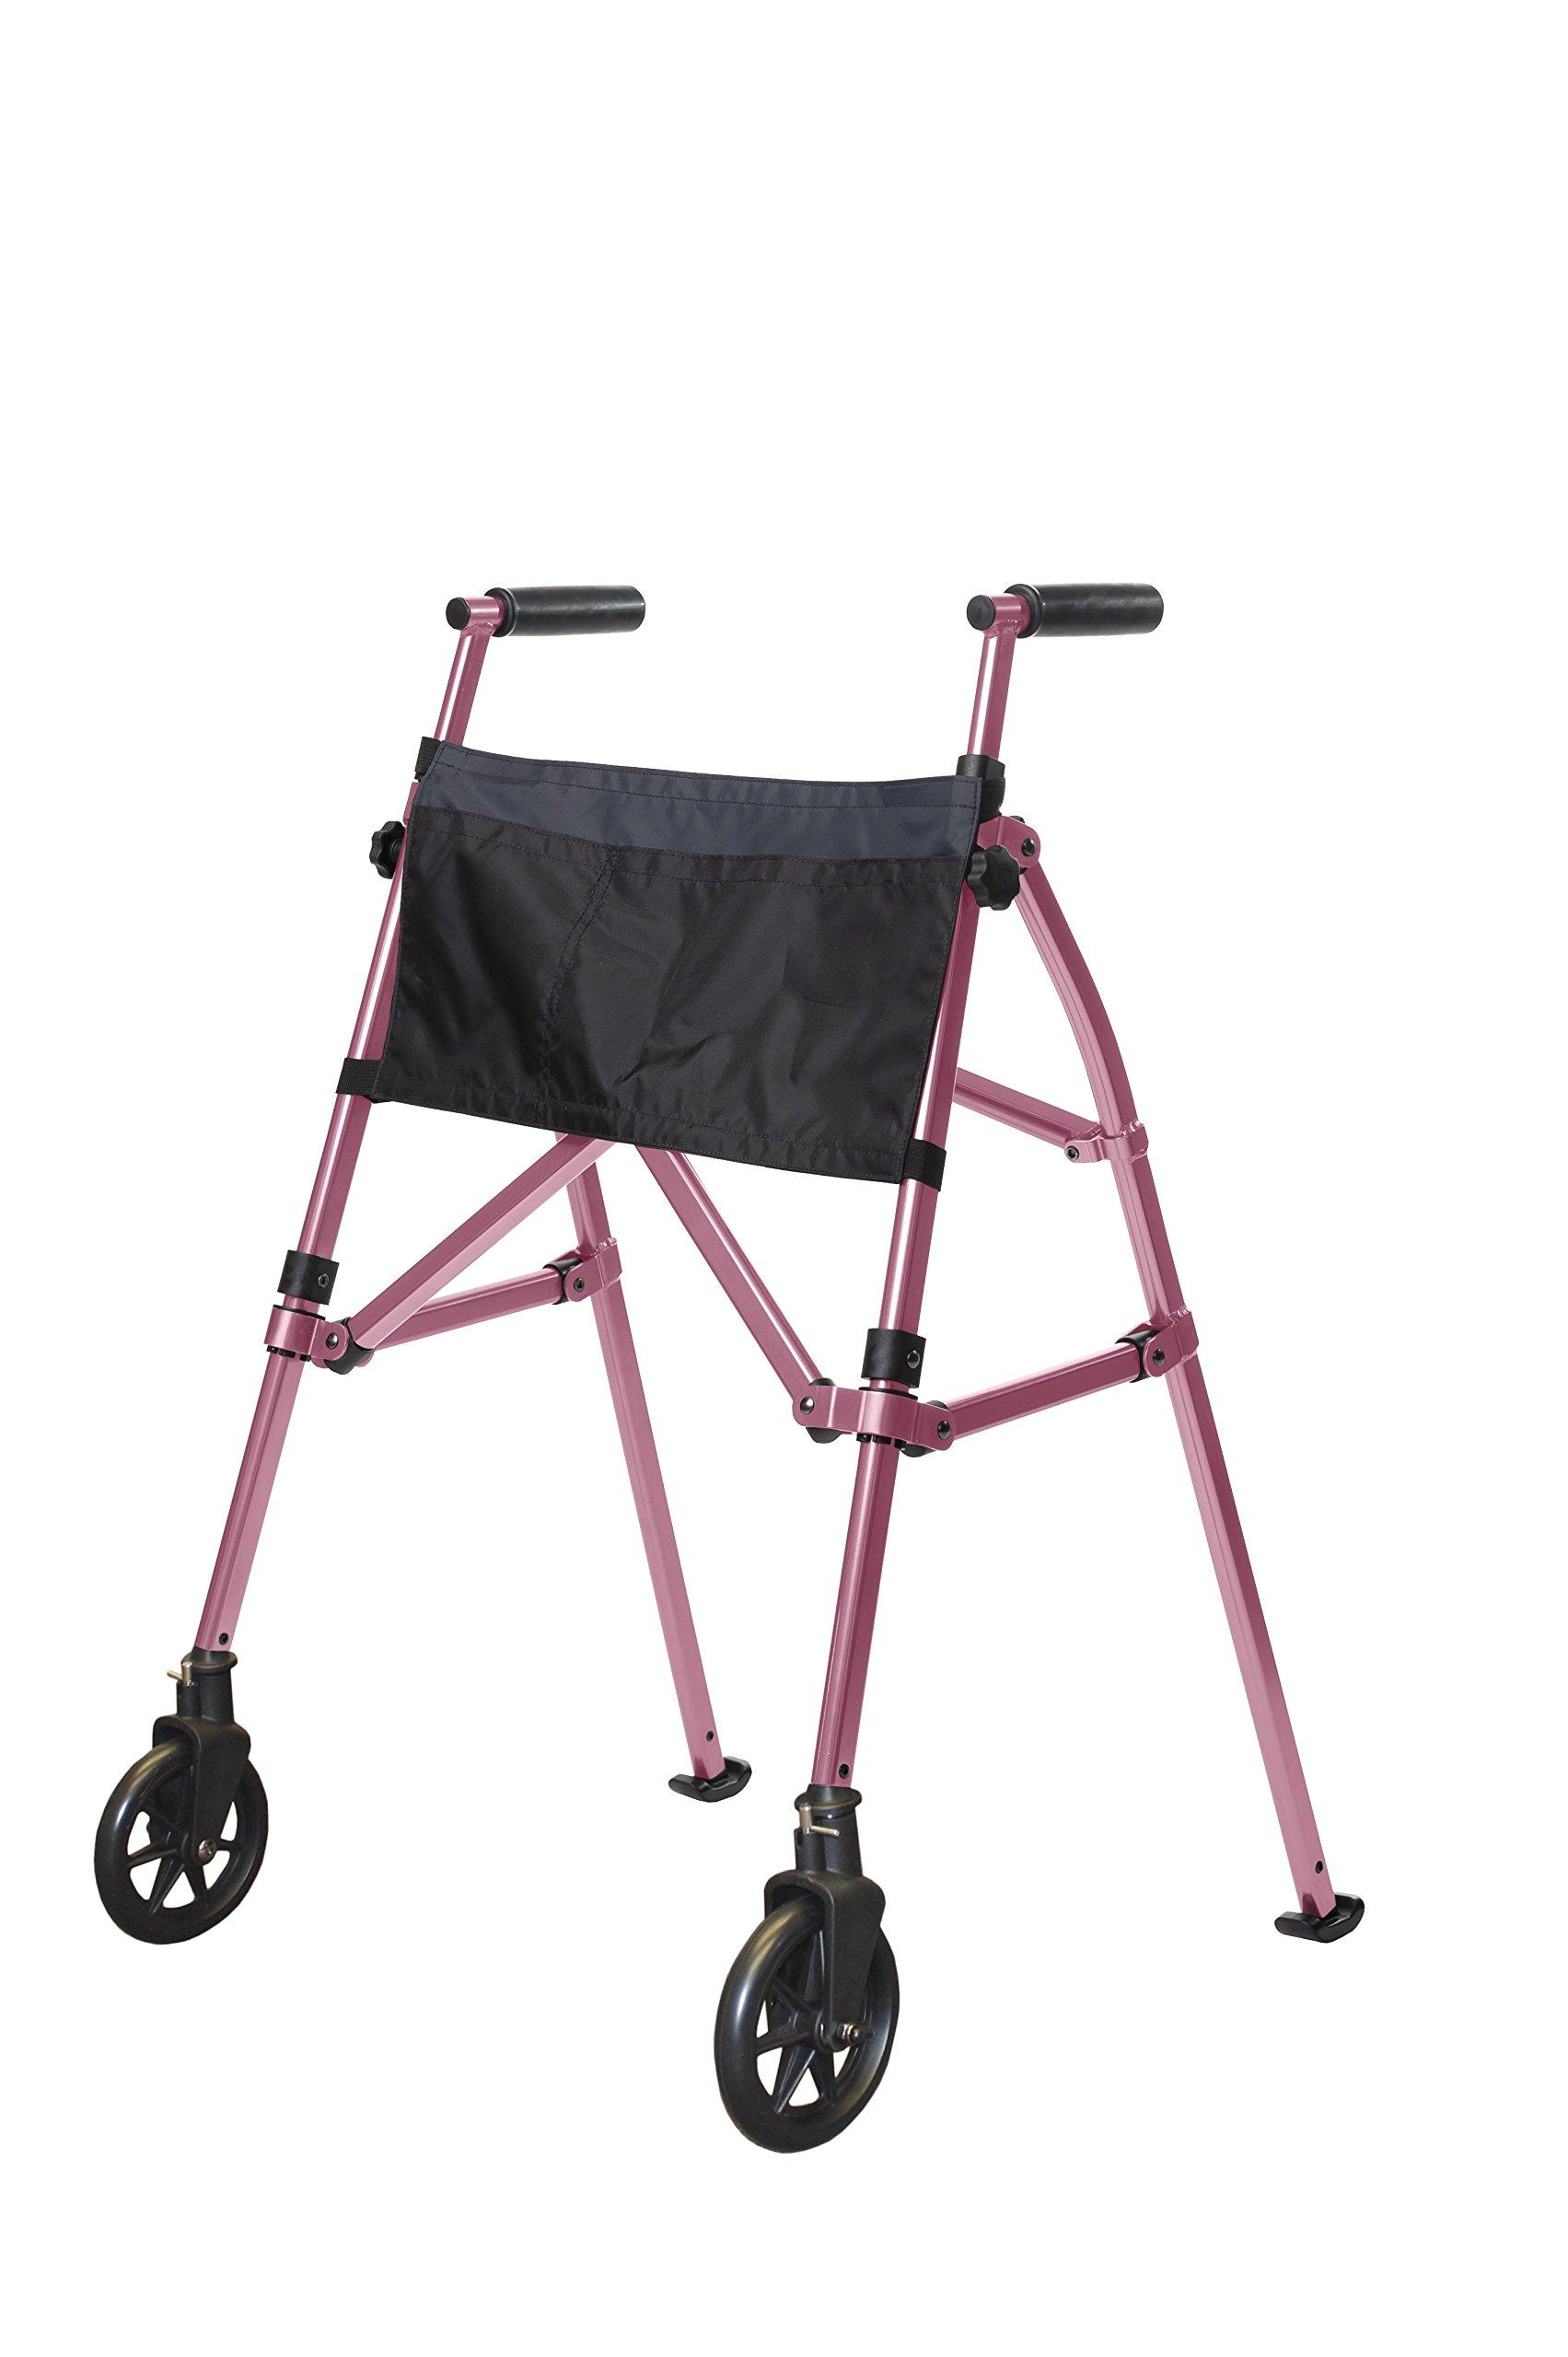 Stander EZ Fold-N-Go Walker - Lightweight Folding & Height Adjustable Adult Travel Walker for Seniors + Locking Swivel Wheels & Pouch - Regal Rose